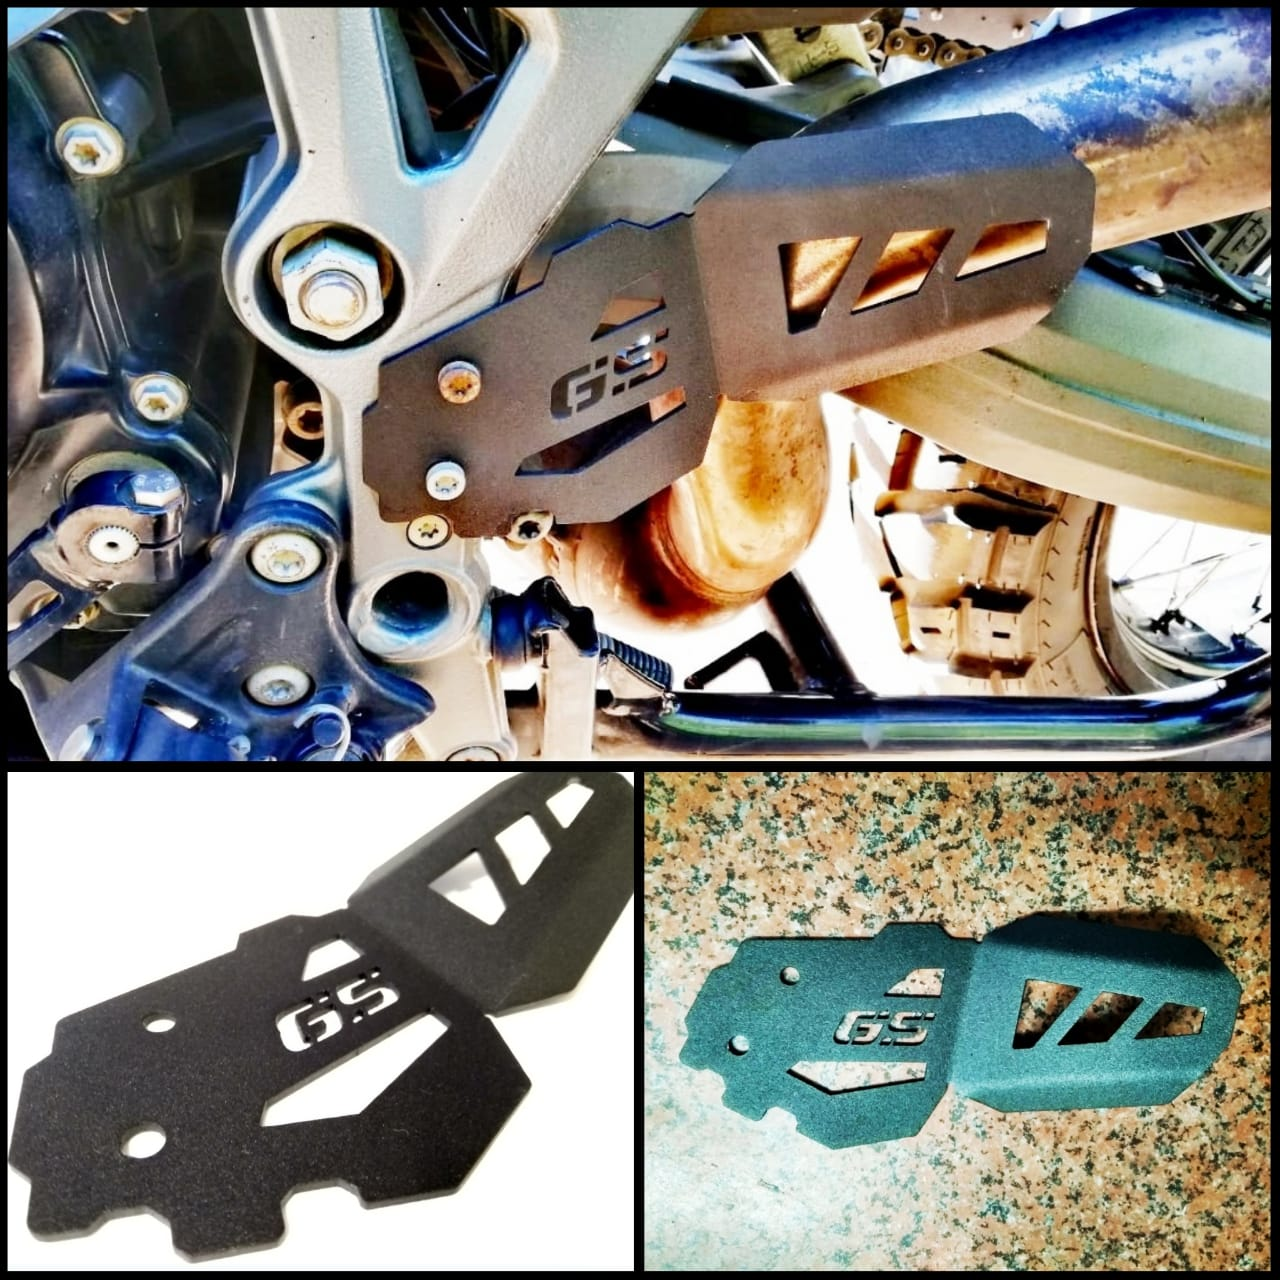 BMW 1200, F800 GS Accessories